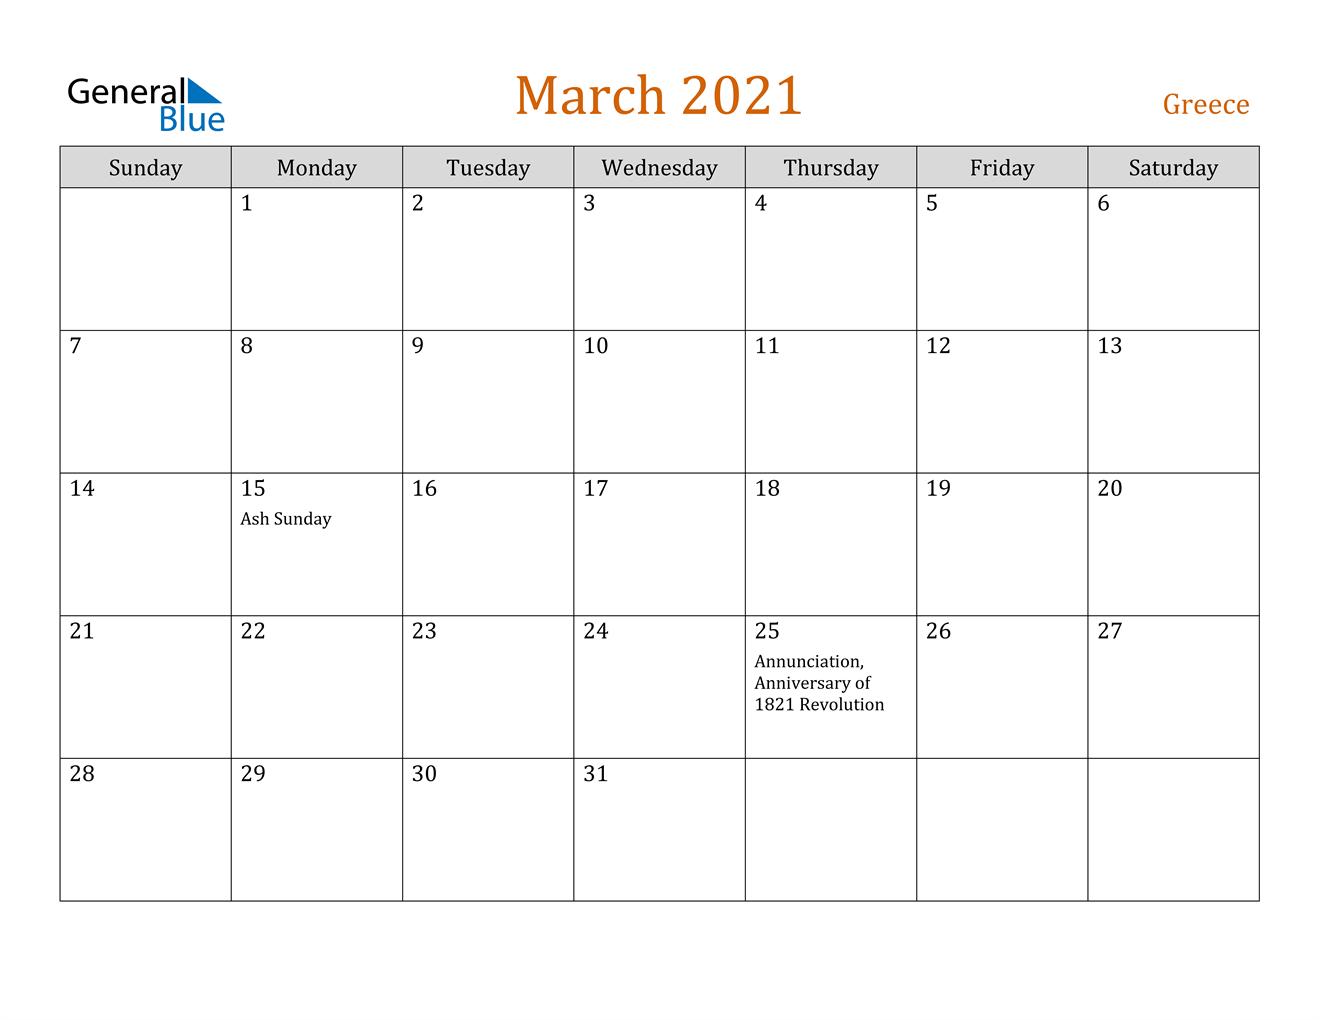 March 2021 Calendar - Greece